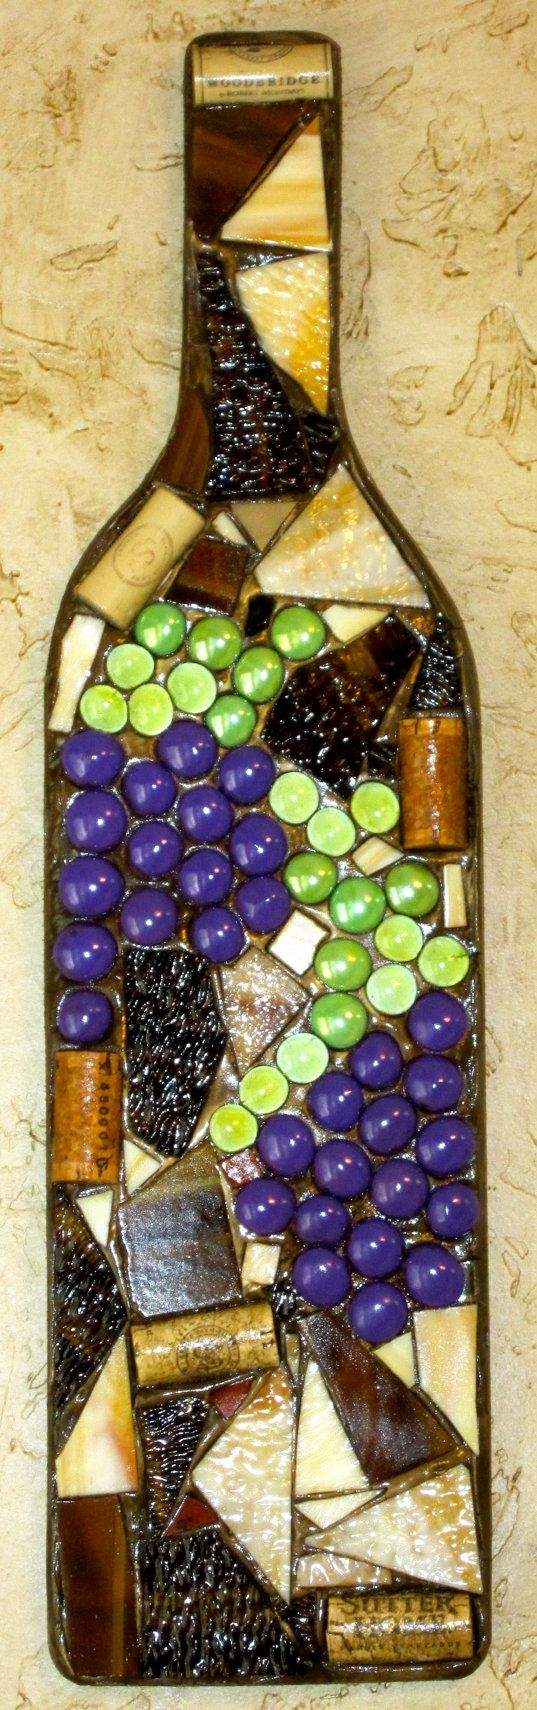 Bottled Grapes